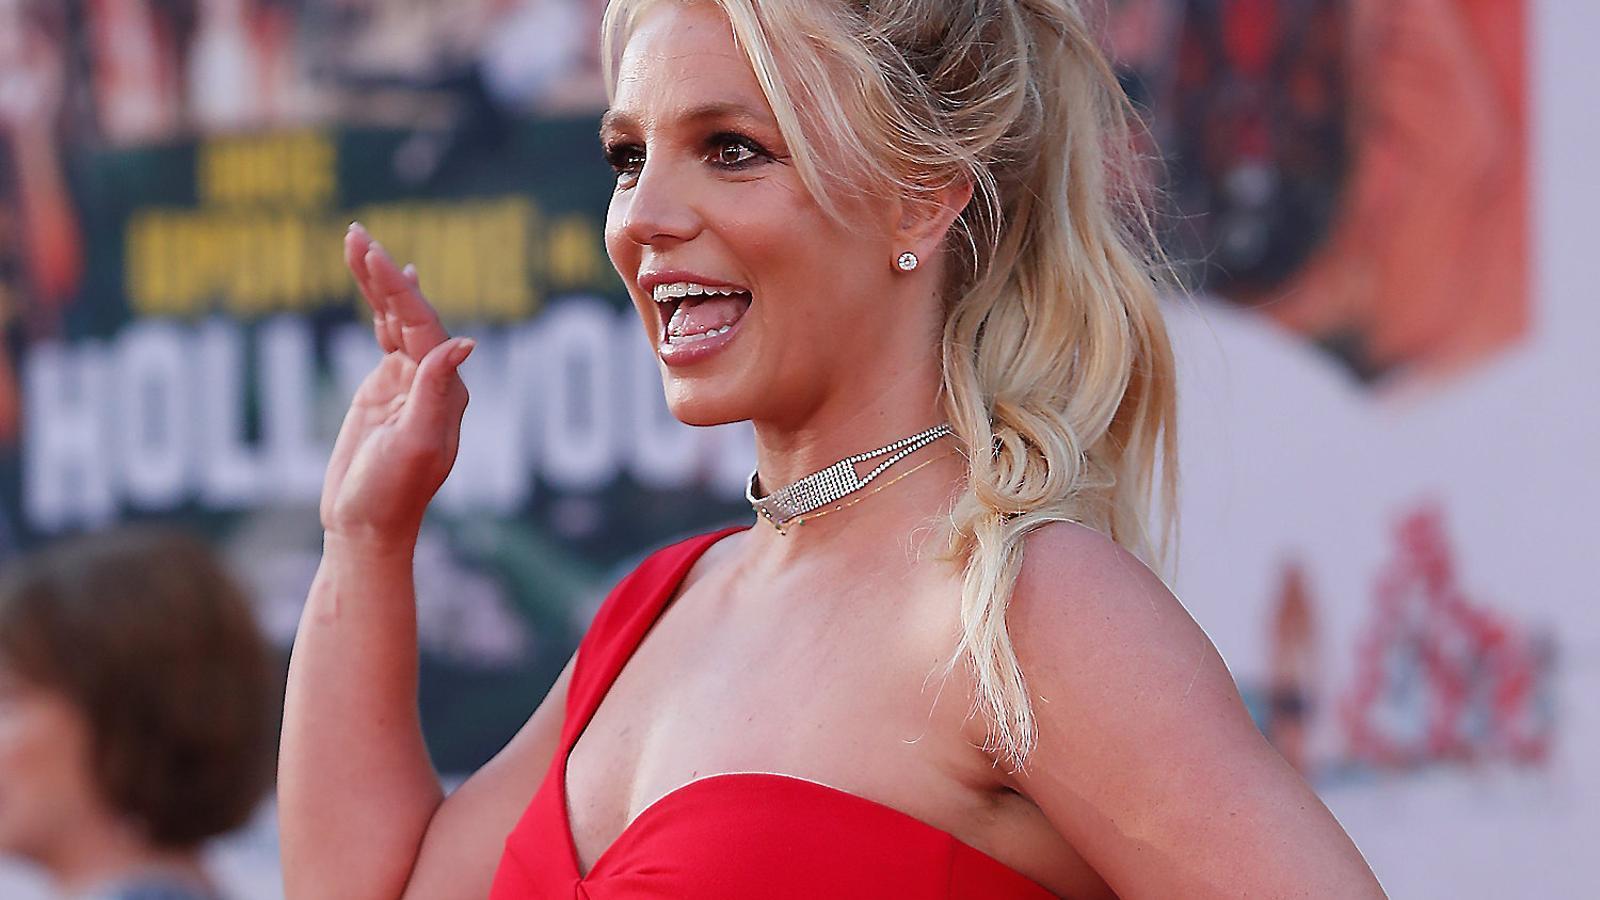 Allibereu Britney Spears